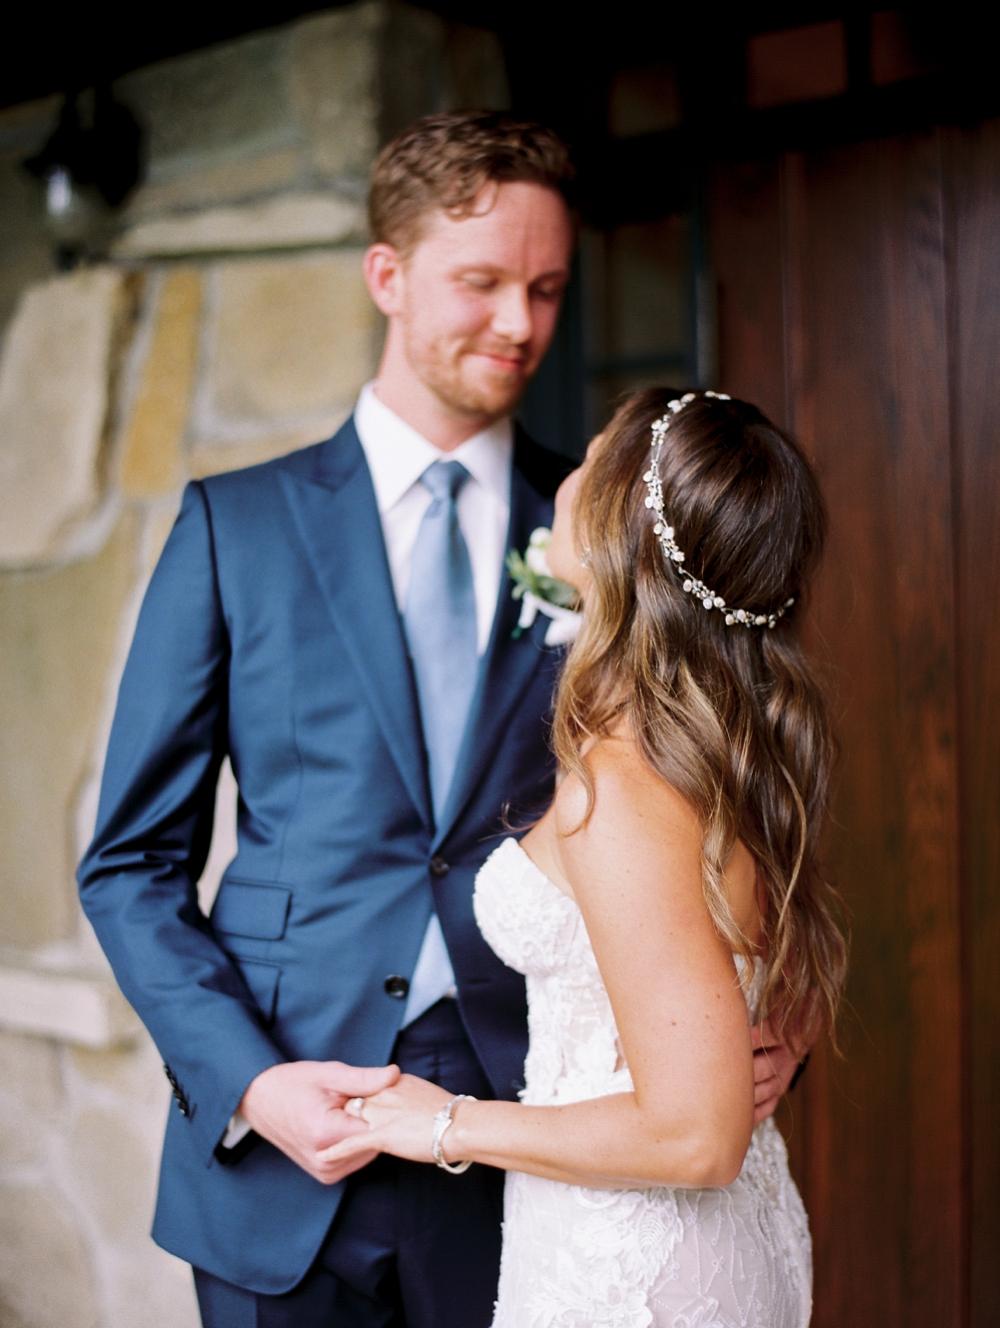 Kristin-La-Voie-Photography-CHICAGO-WEDDING-PHOTOGRAPHER-KOHLER-WHISTLING-STRAITS-102